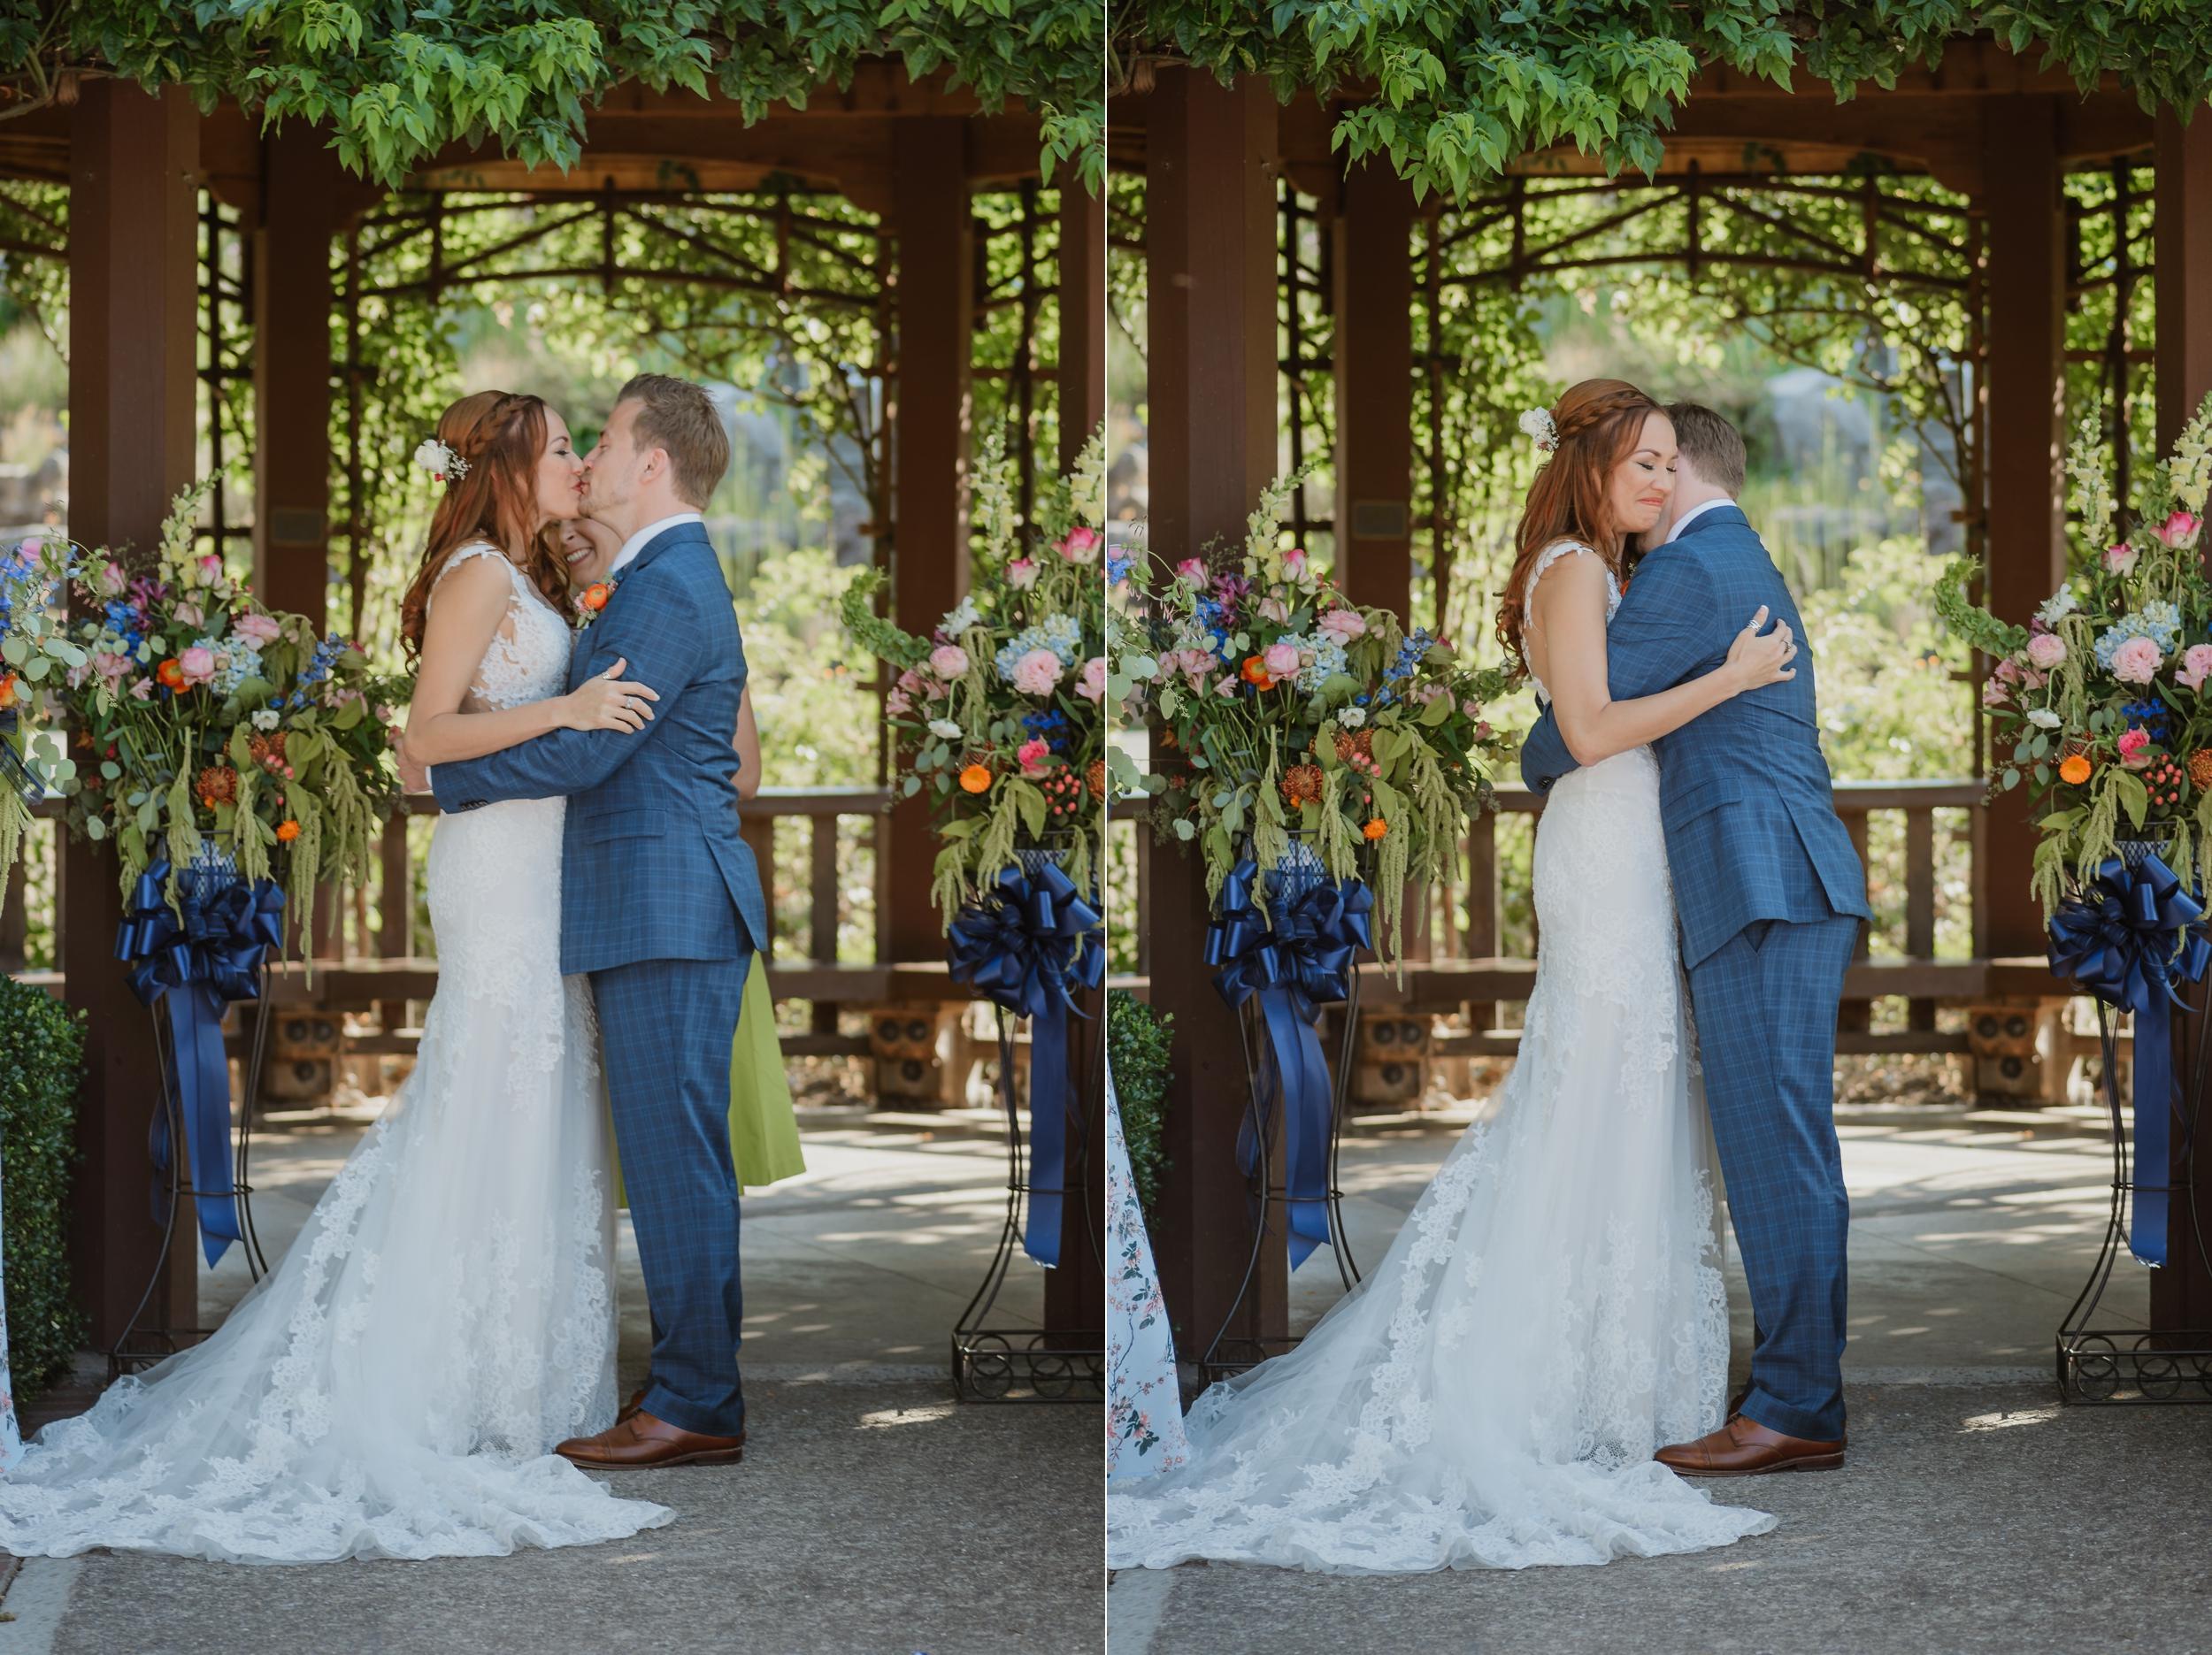 35-walnut-creek-gardens-heather-farms-wedding-vivianchen-287_WEB.jpg